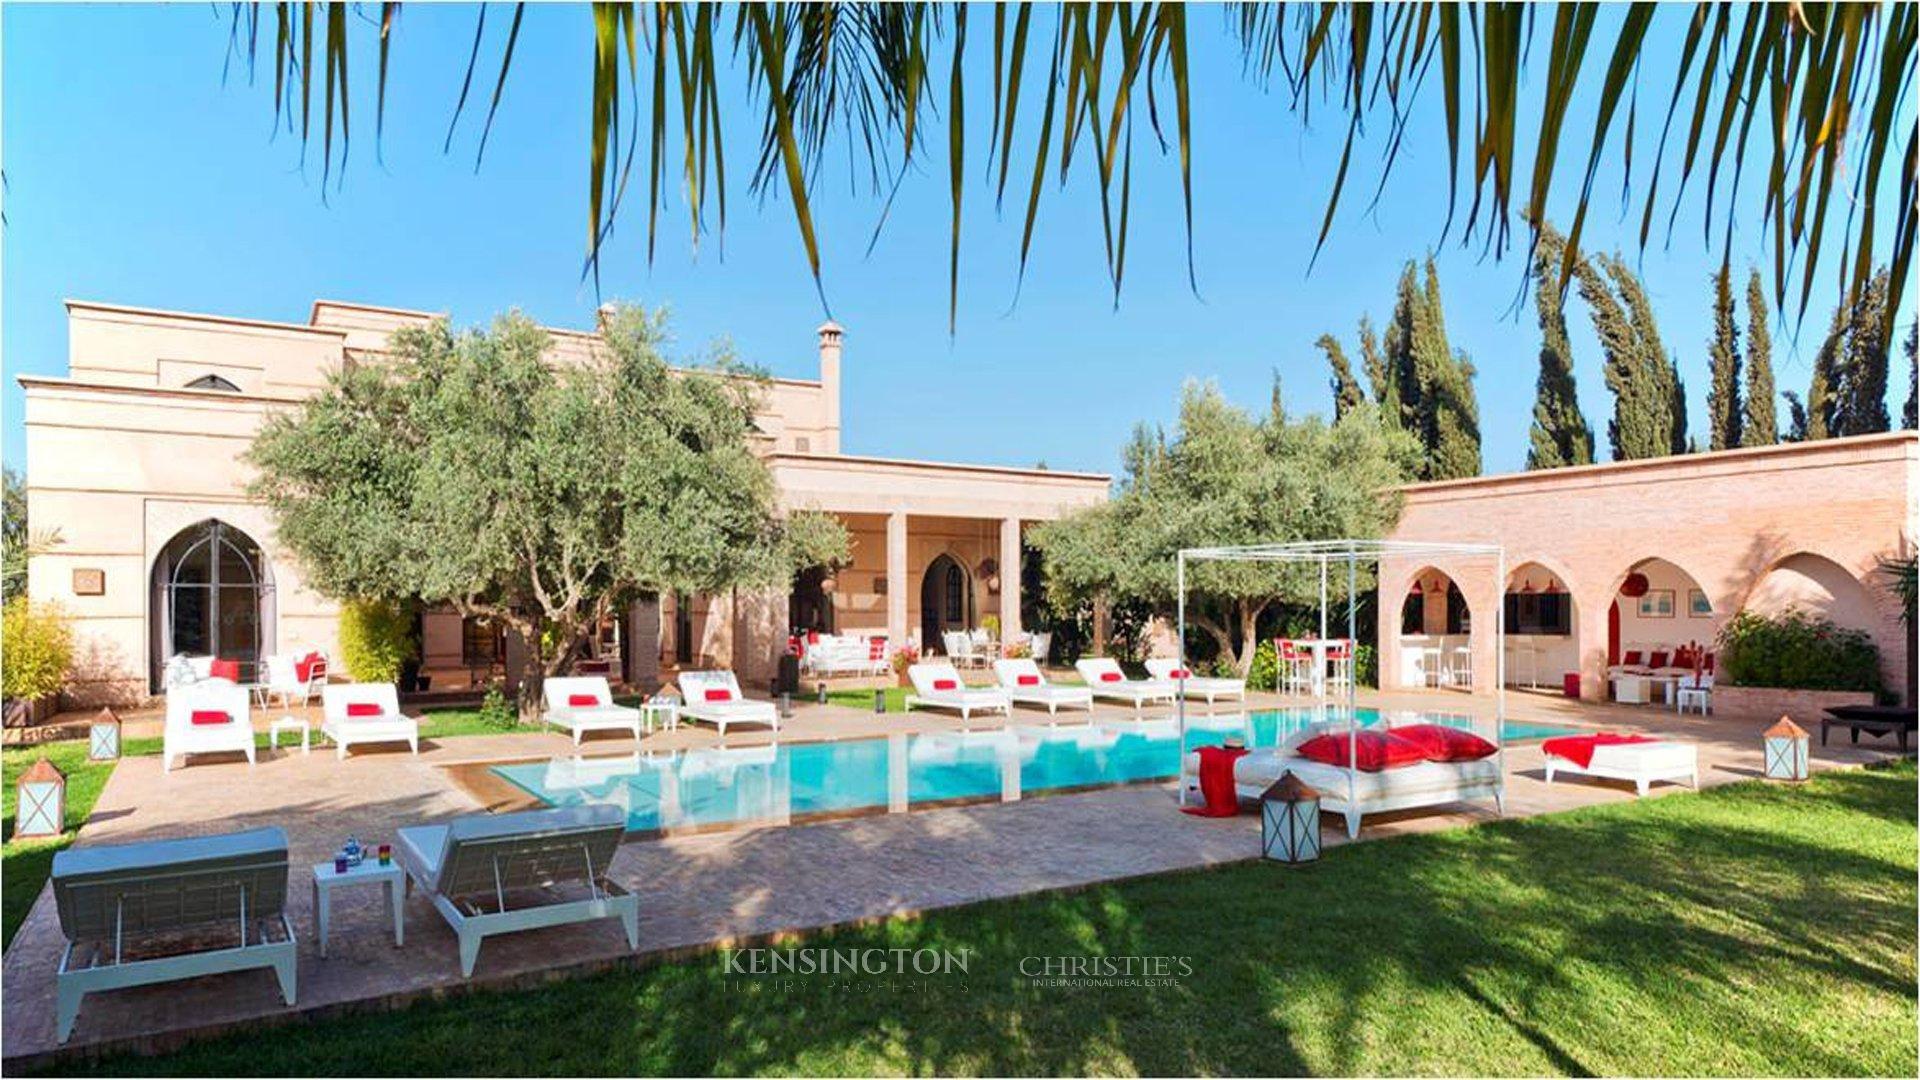 KPPM00618: Villa Sadani Luxury Villa Marrakech Morocco